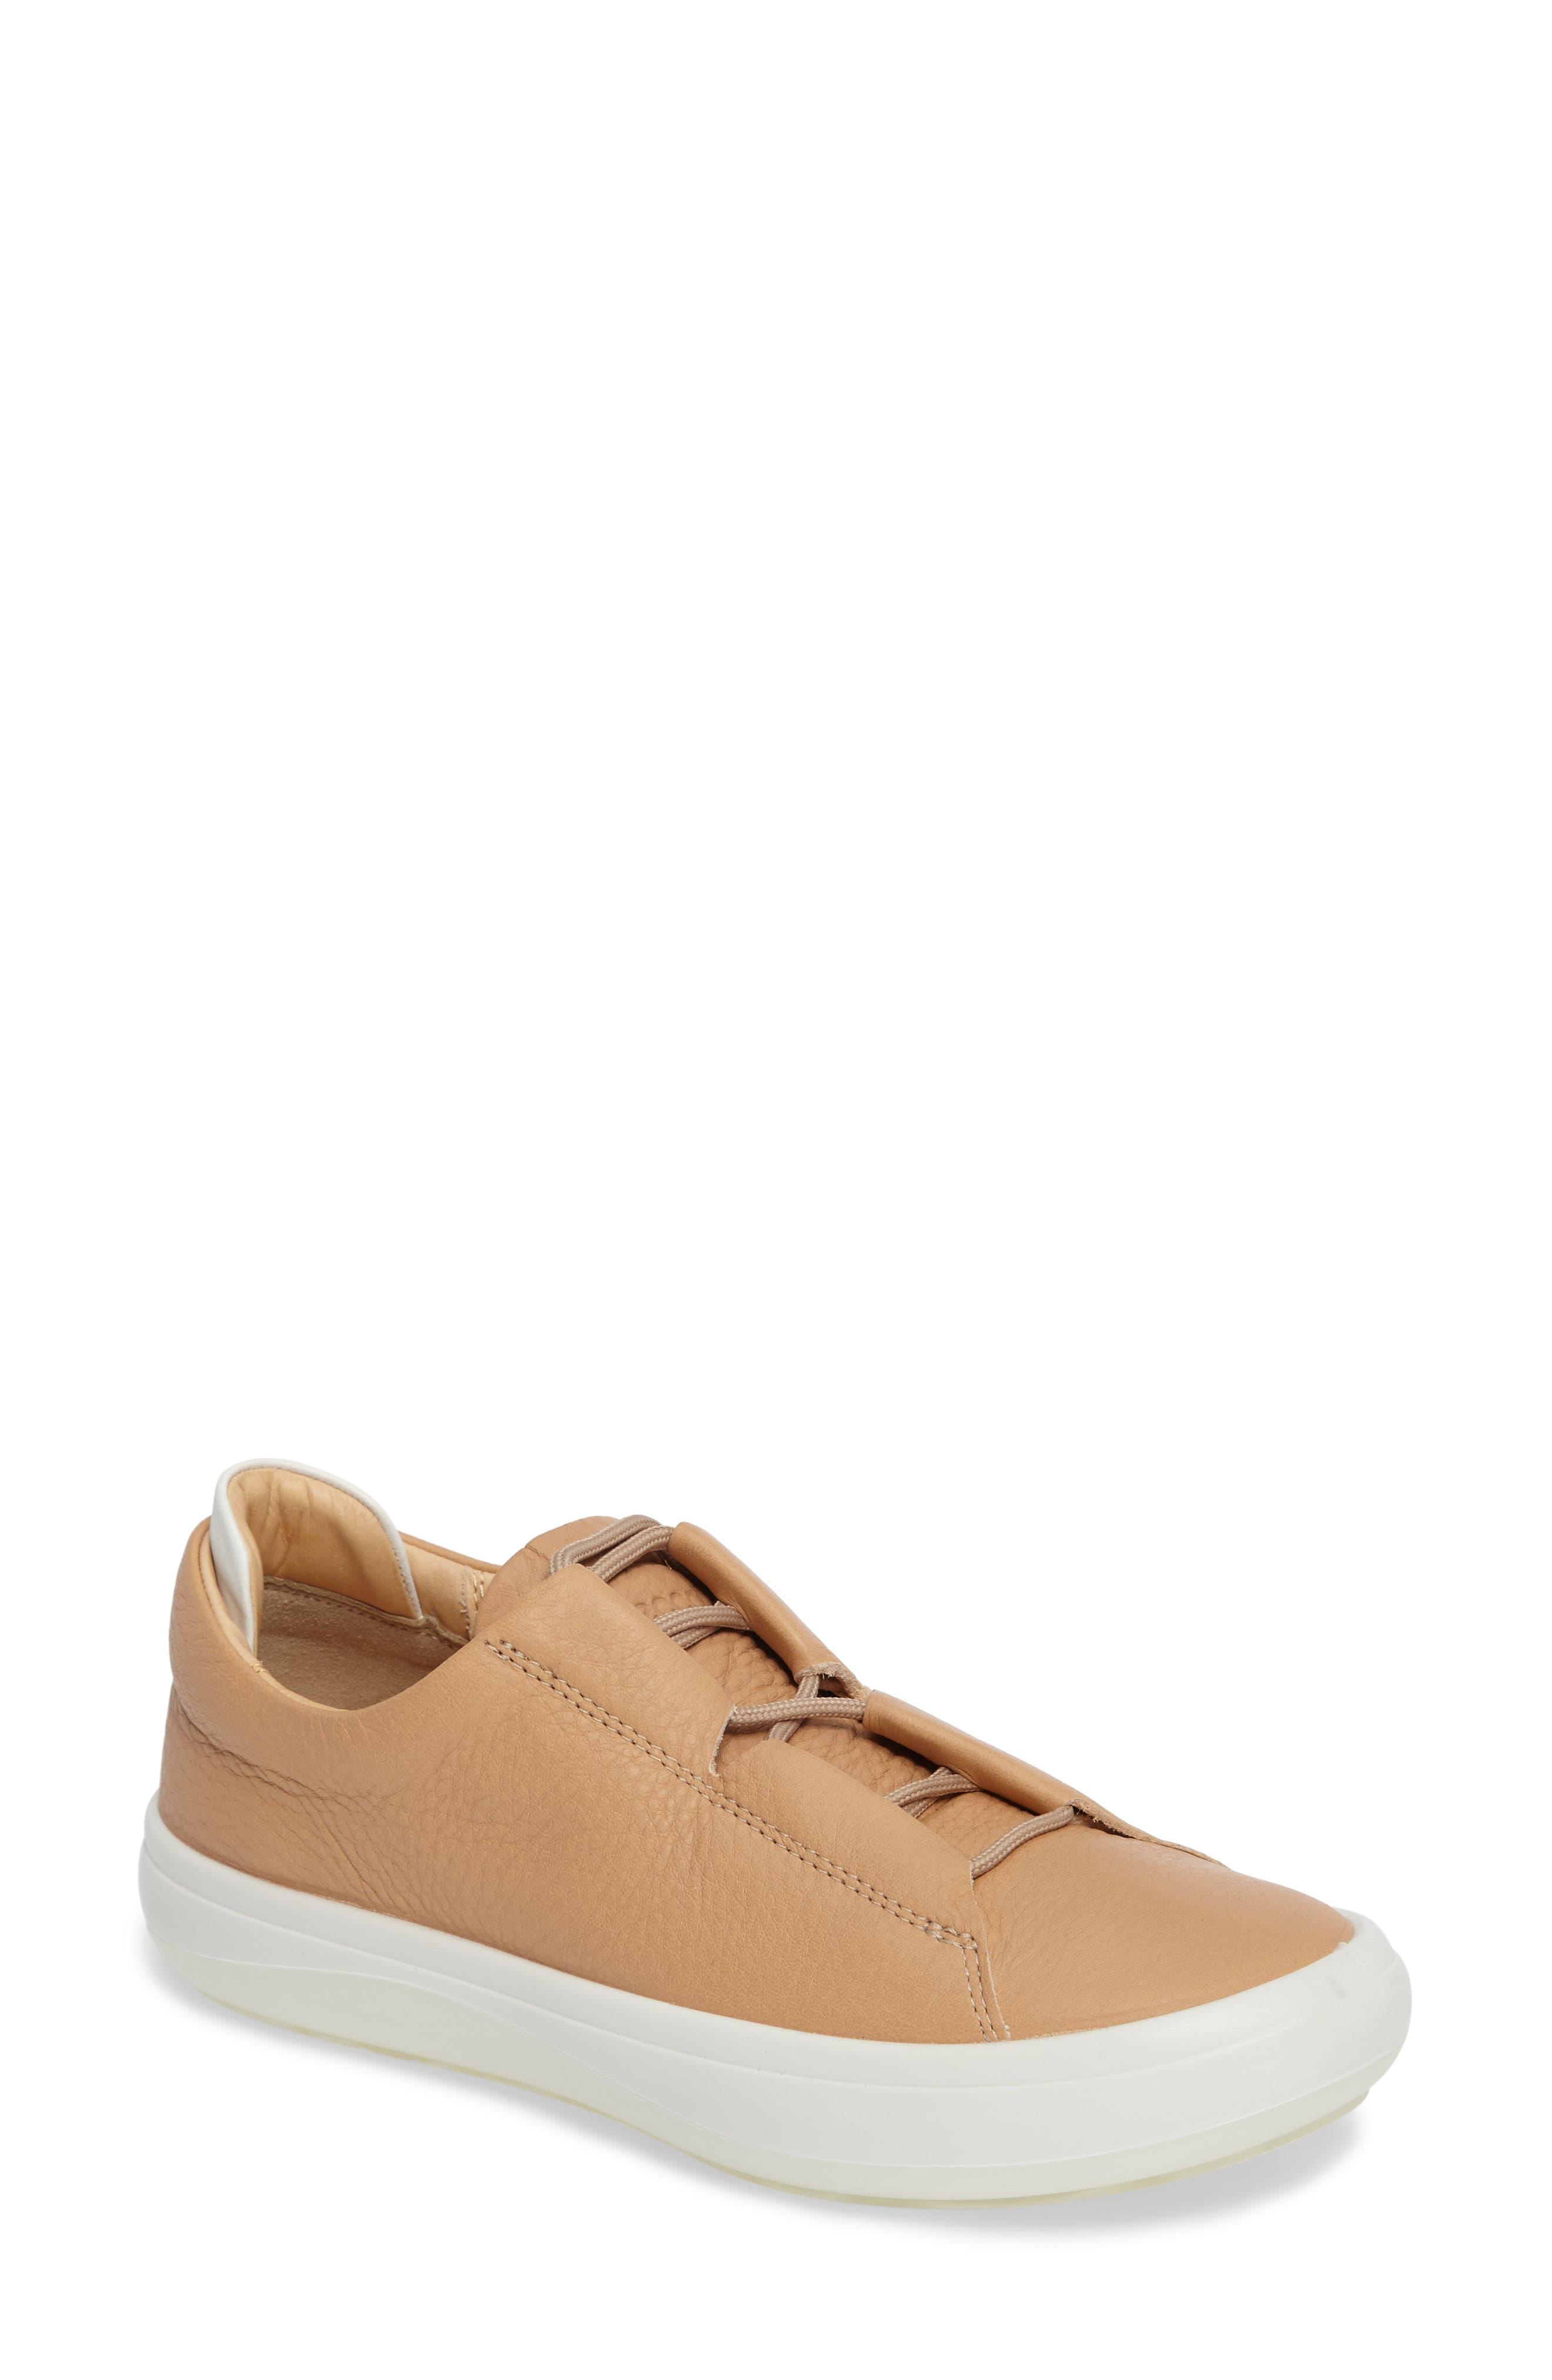 Alternate Image 1 Selected - ECCO Kinhin Low Top Sneaker (Women)